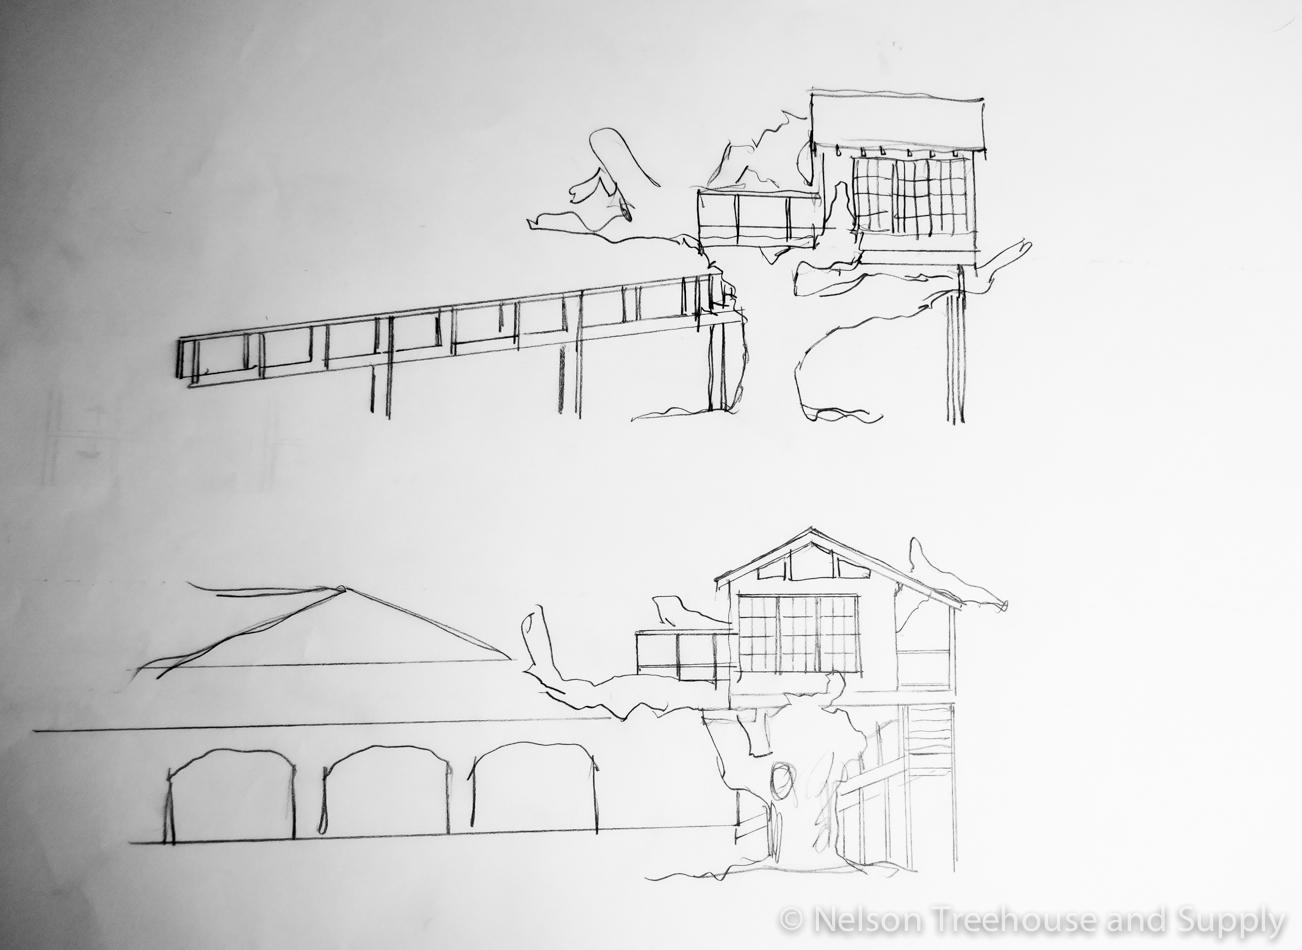 laurel_dining_treehouse_sketch